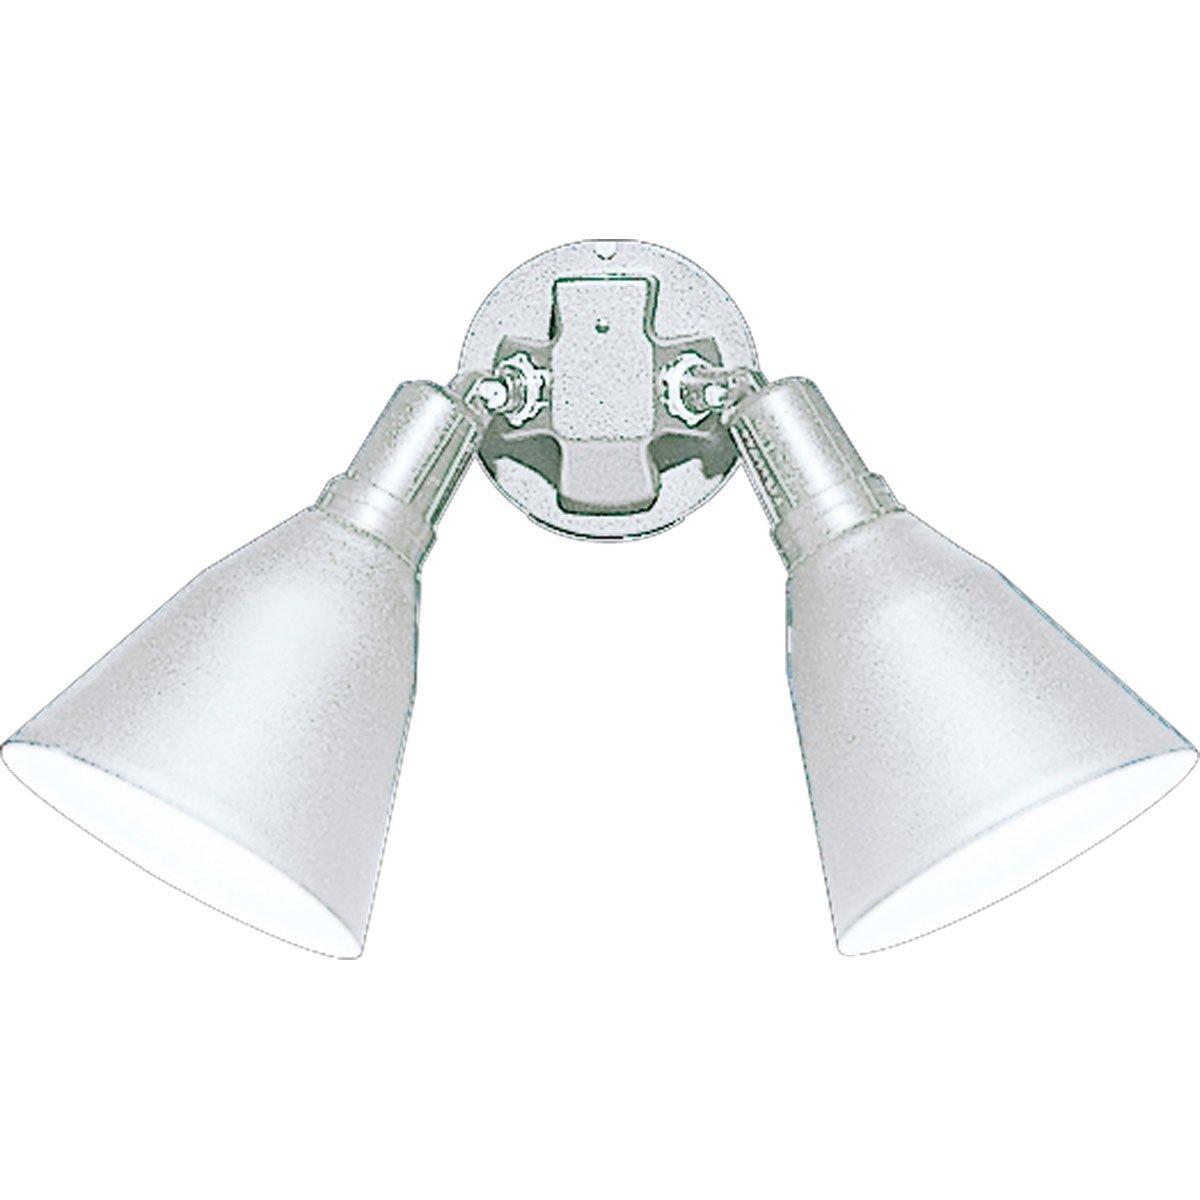 Progress Lighting P5203-30 2 Painted Adjustable Swivel Floodlights All Aluminum, White